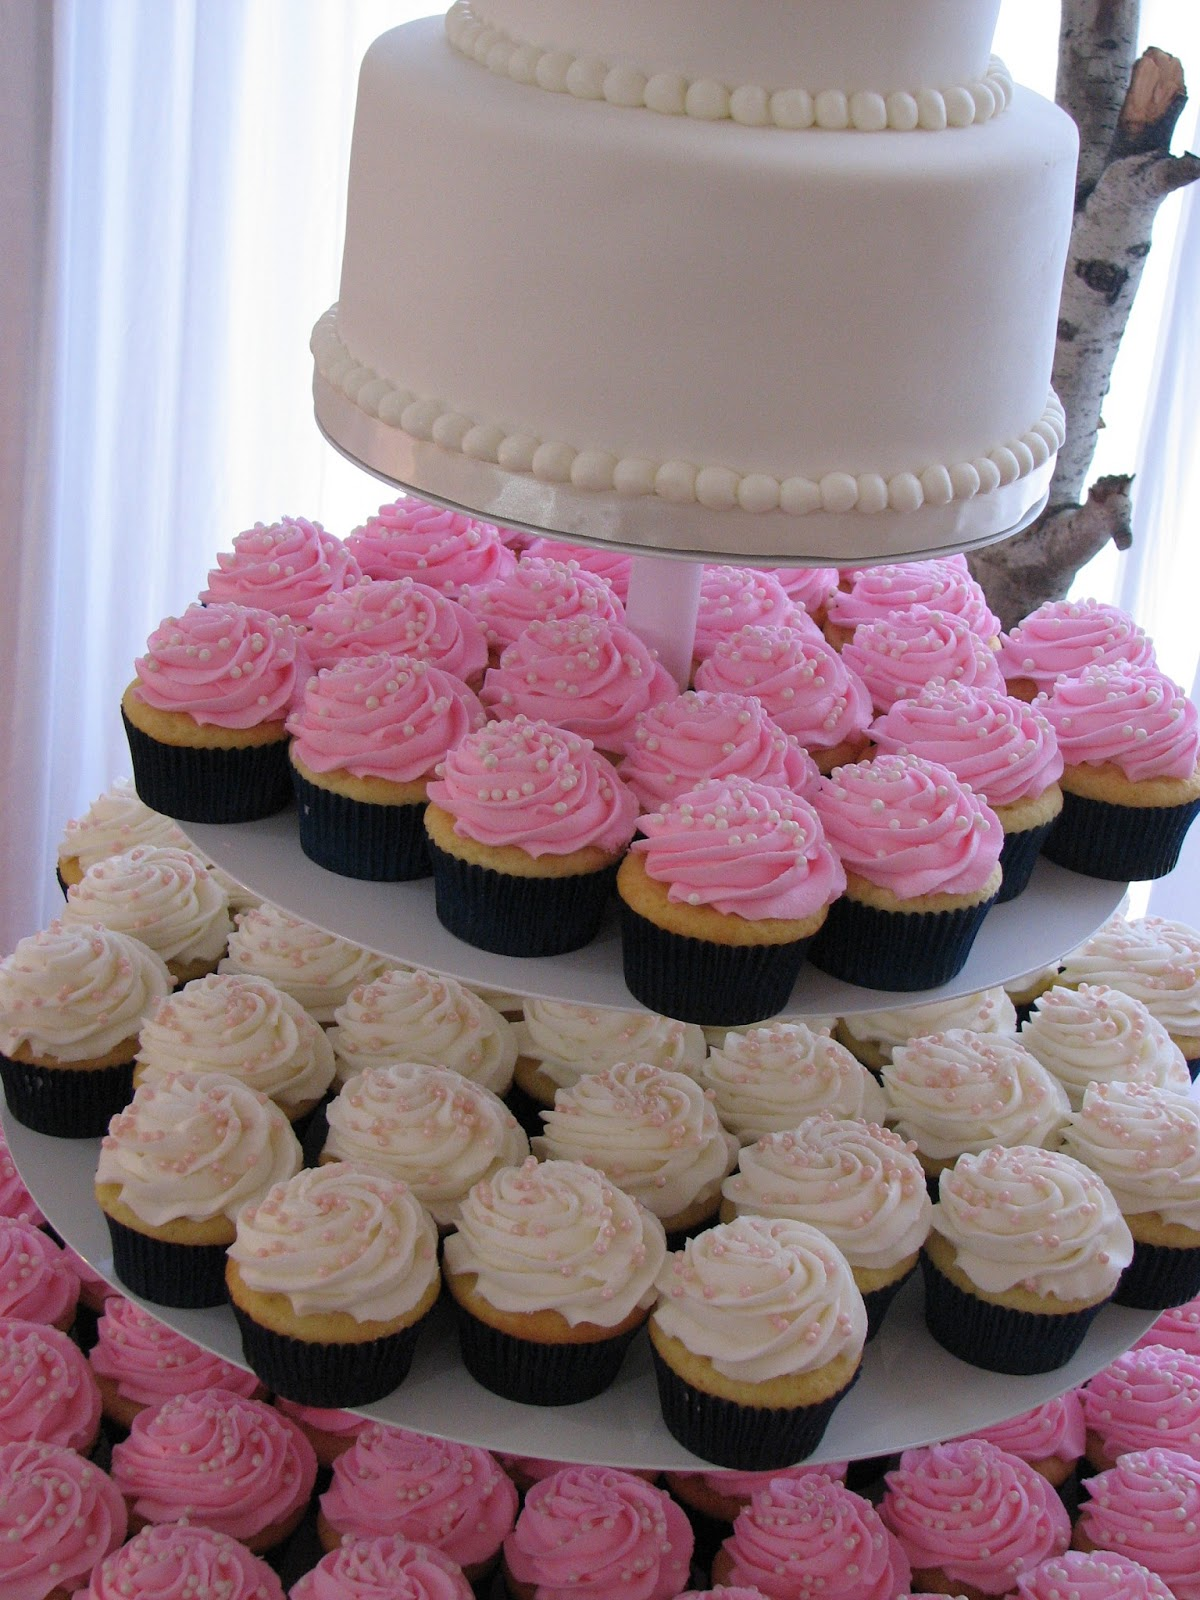 blue and fuschia wedding cakes wedding cakes pYylQ BmB*Xp10uAgXI*bxtr*L6qGhA wedding cupcake ideas Designs